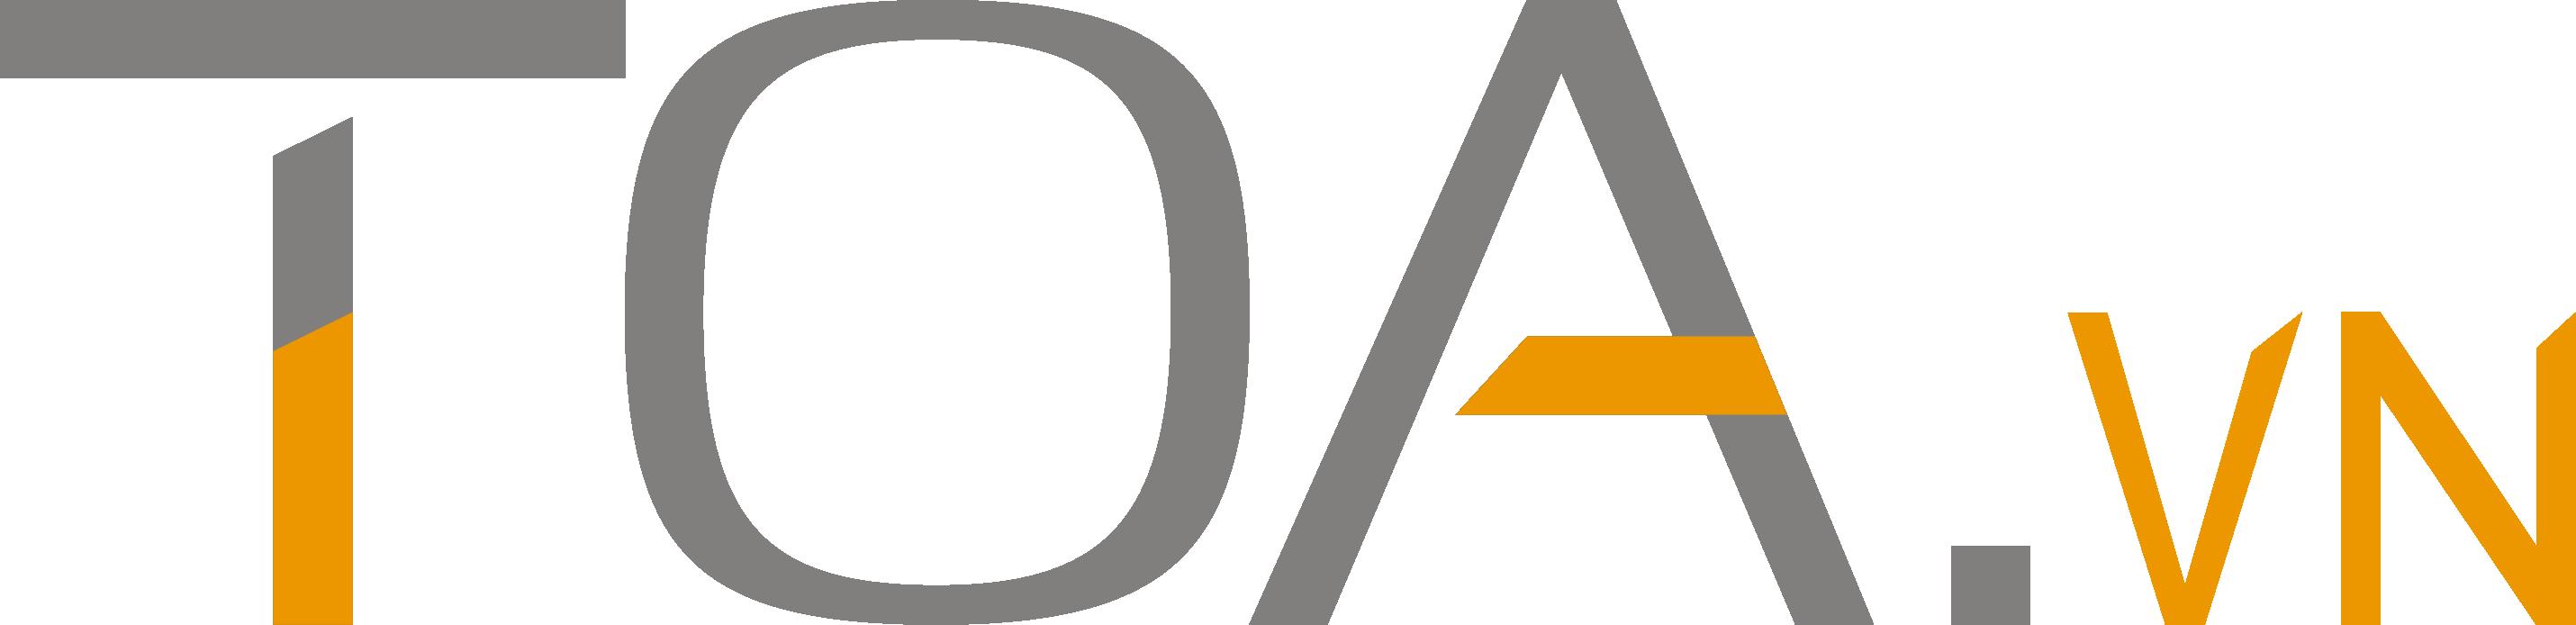 logo-toa-cua-trung-chinh-audio